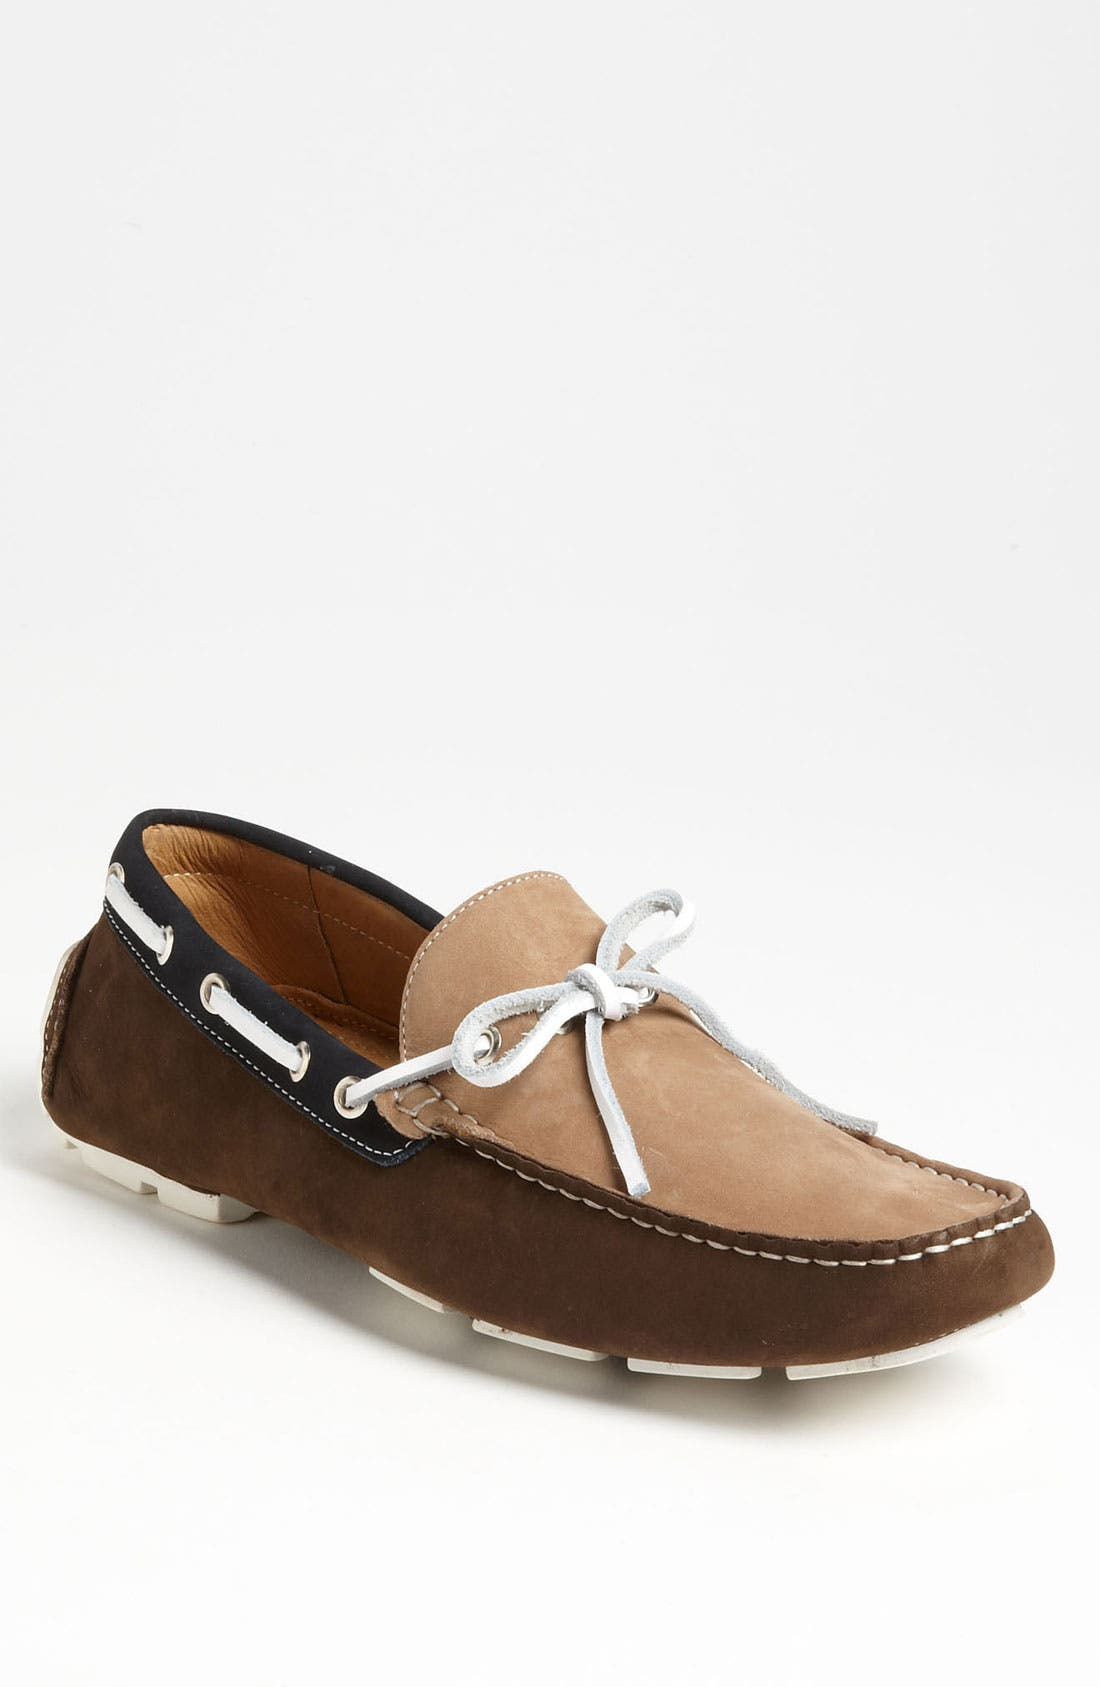 Alternate Image 1 Selected - 1901 'Barbados' Driving Shoe (Men)